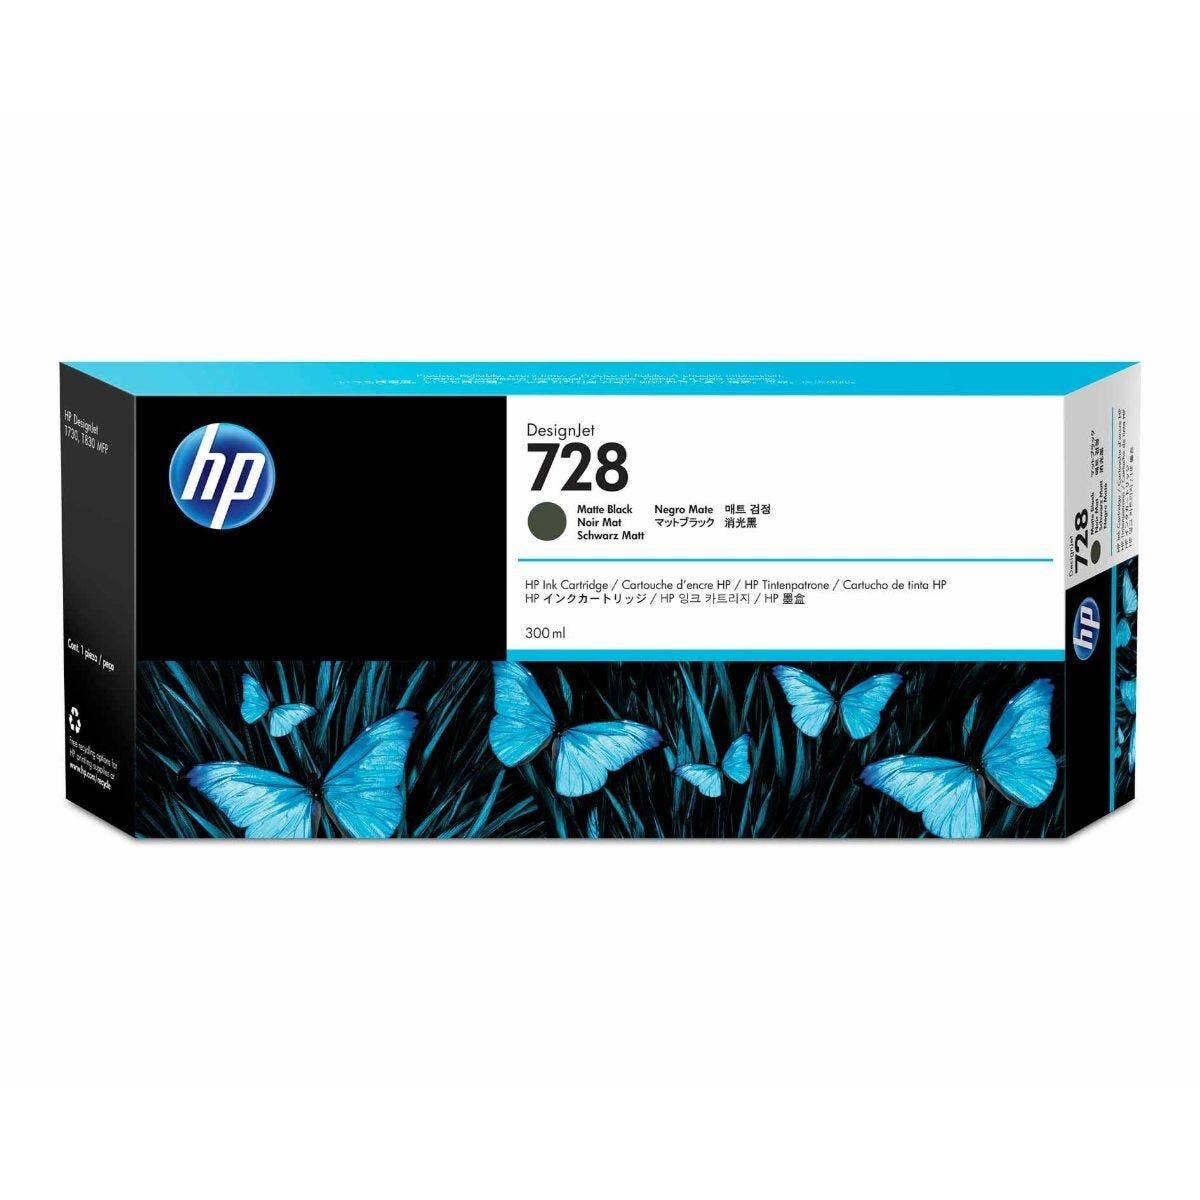 HP 728 Matte Black Original Ink Cartridge